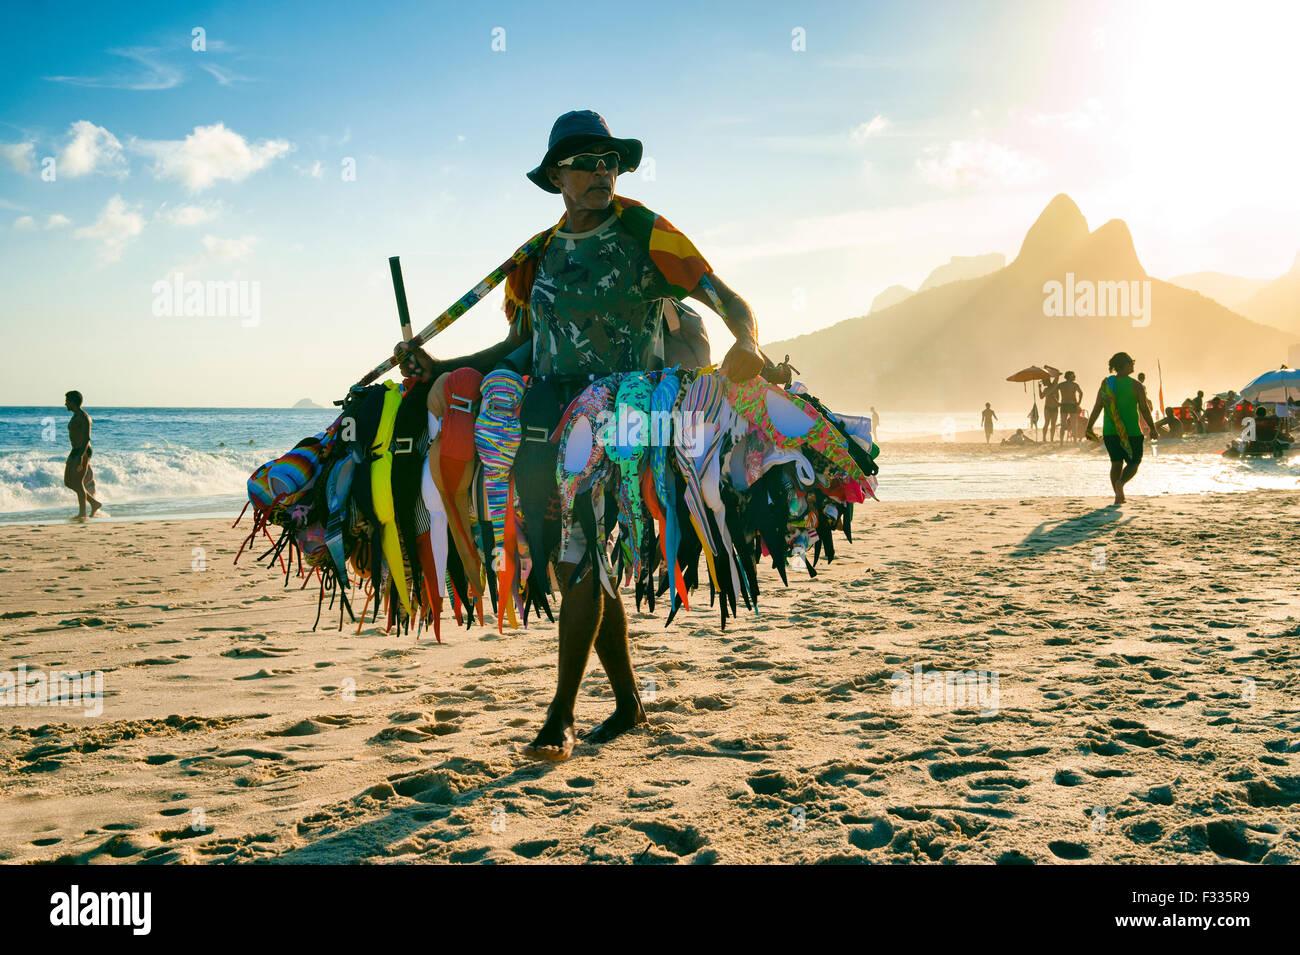 RIO DE JANEIRO, BRAZIL - JANUARY 20, 2013: Vendor selling bikini bathing suits walks on Ipanema Beach during a misty - Stock Image